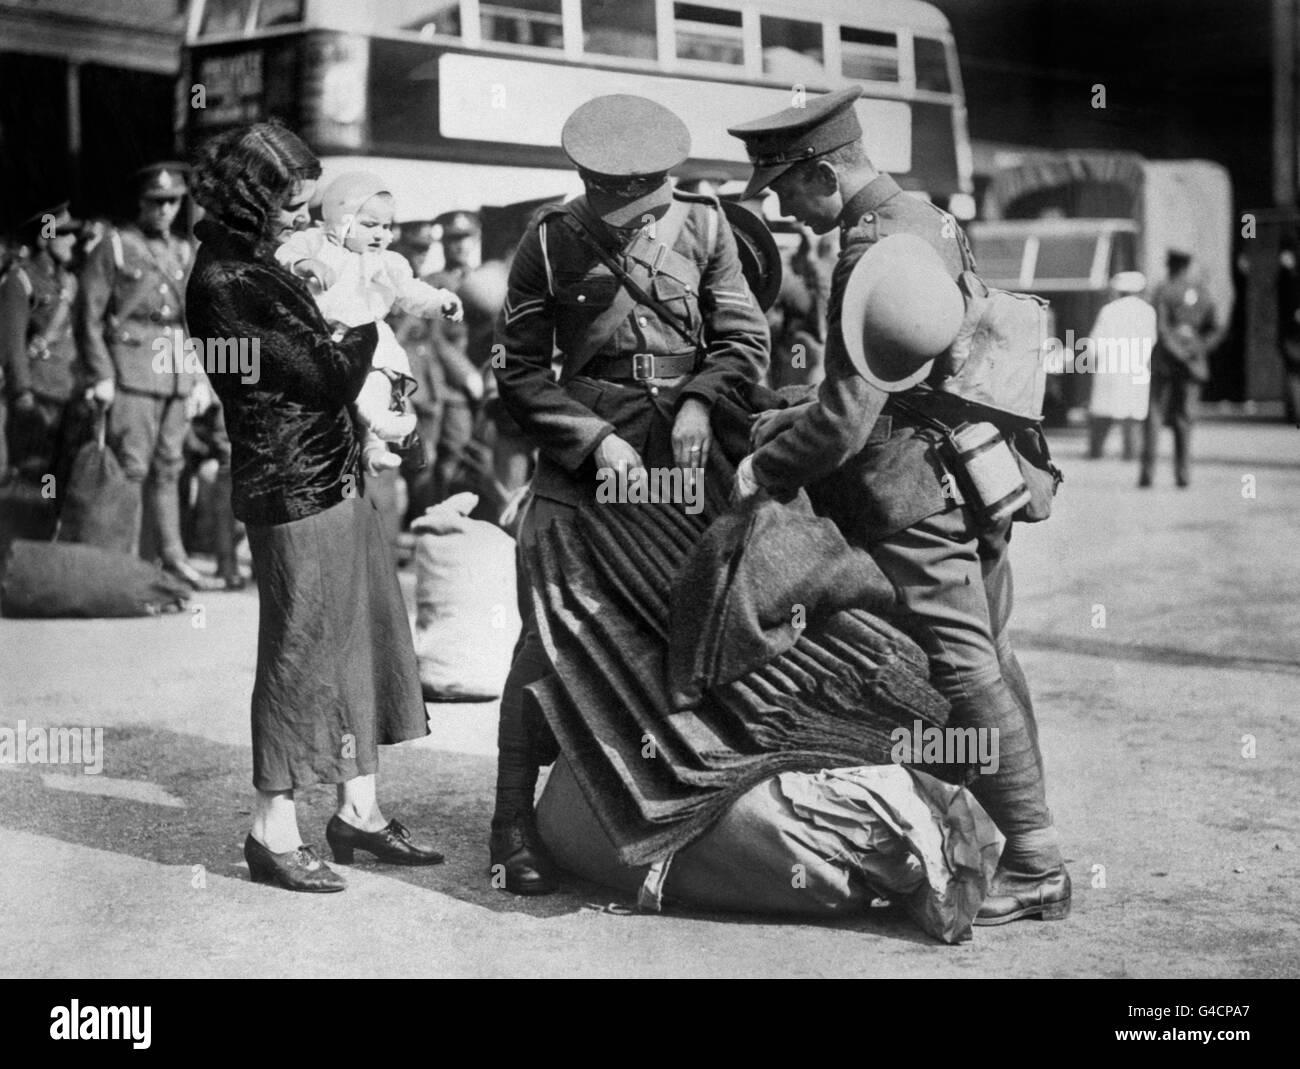 Military - Crisis Precautionary Measures - Territorial Army - London - Stock Image